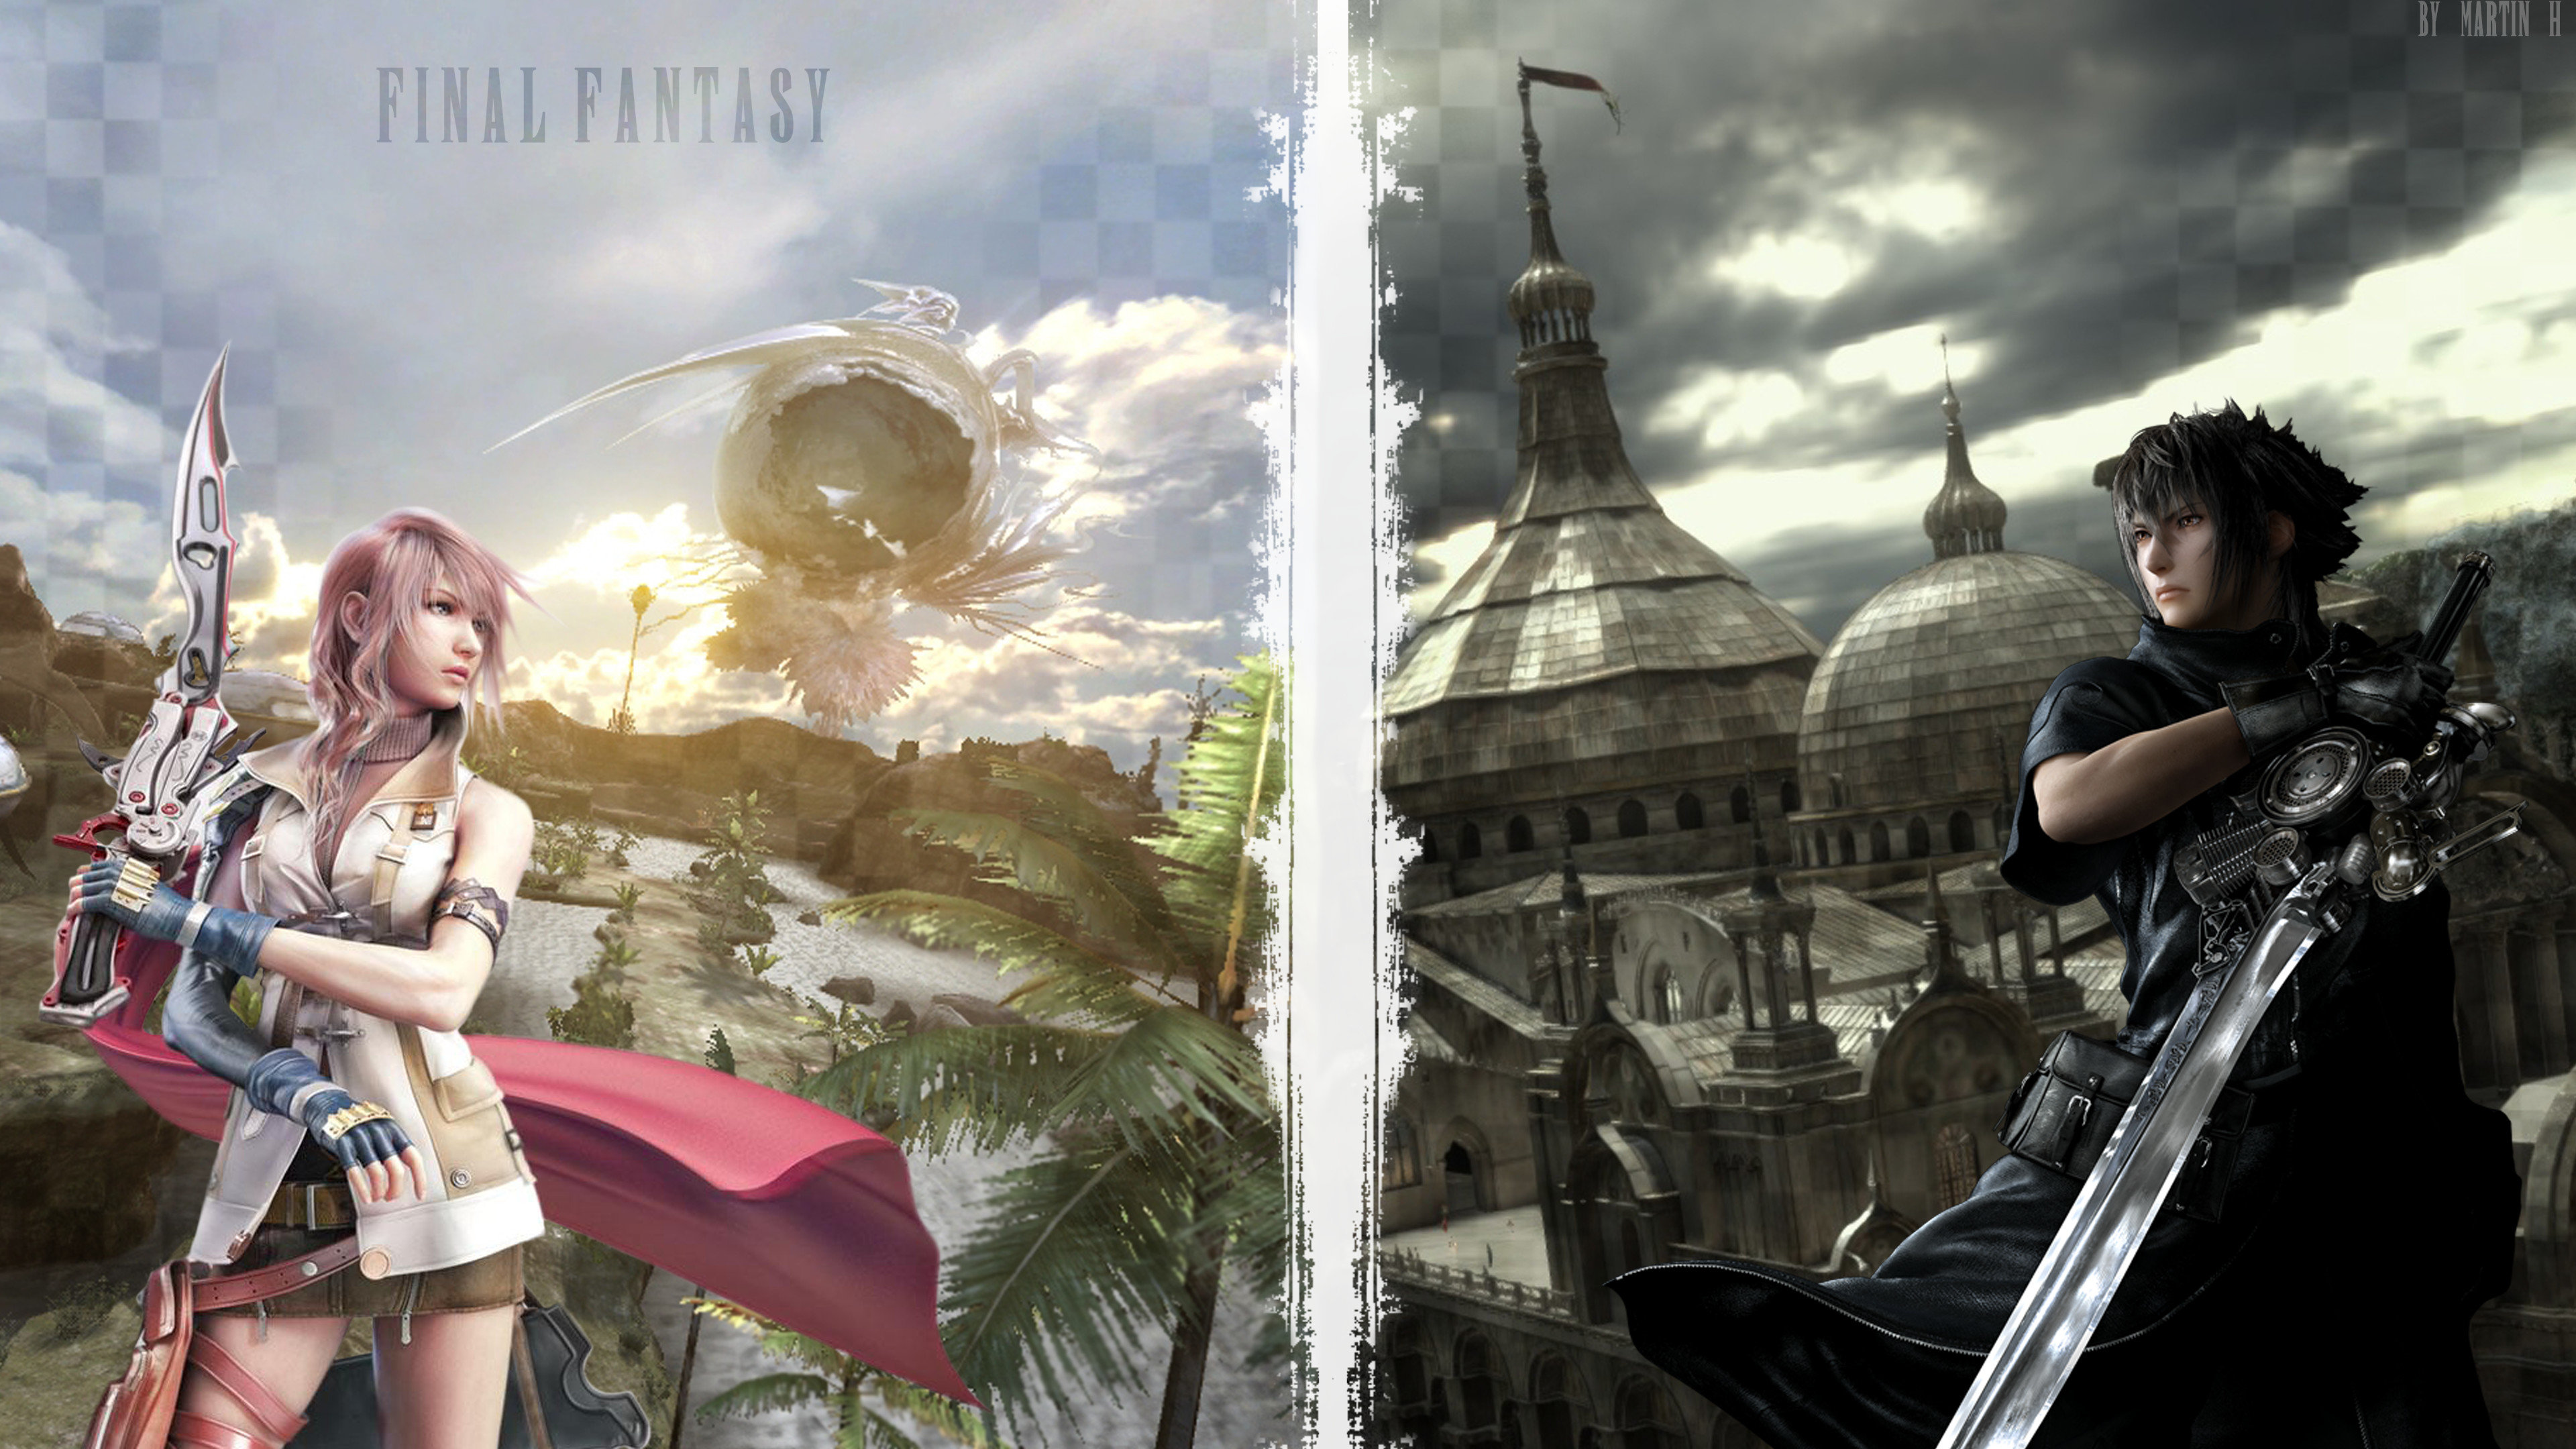 Final Fantasy Type 0 Hd Games 4k Wallpapers Images: Final Fantasy Wallpapers 3840x2160 Ultra HD 4k Desktop